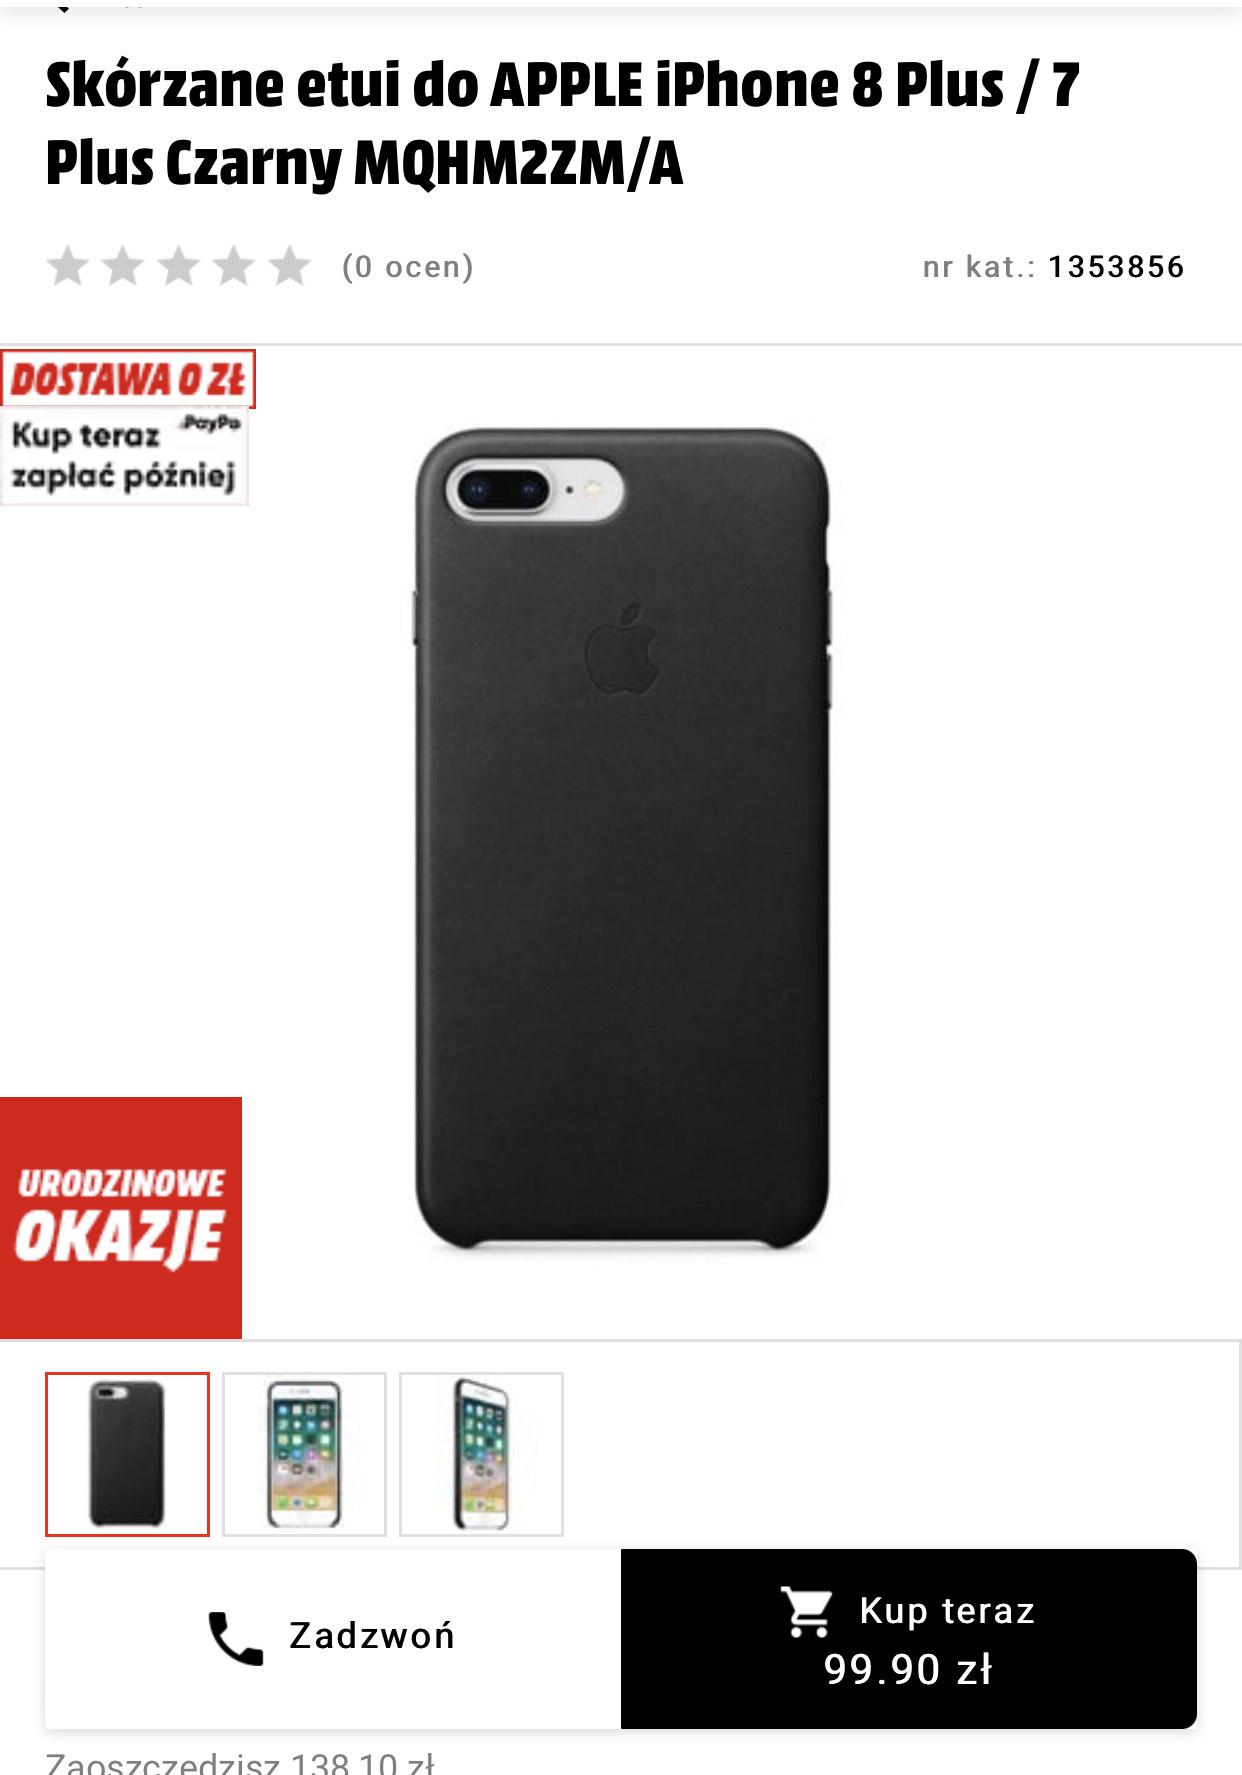 Skórzane etui do APPLE iPhone 8 Plus / 7 Plus Czarny MQHM2ZM/A